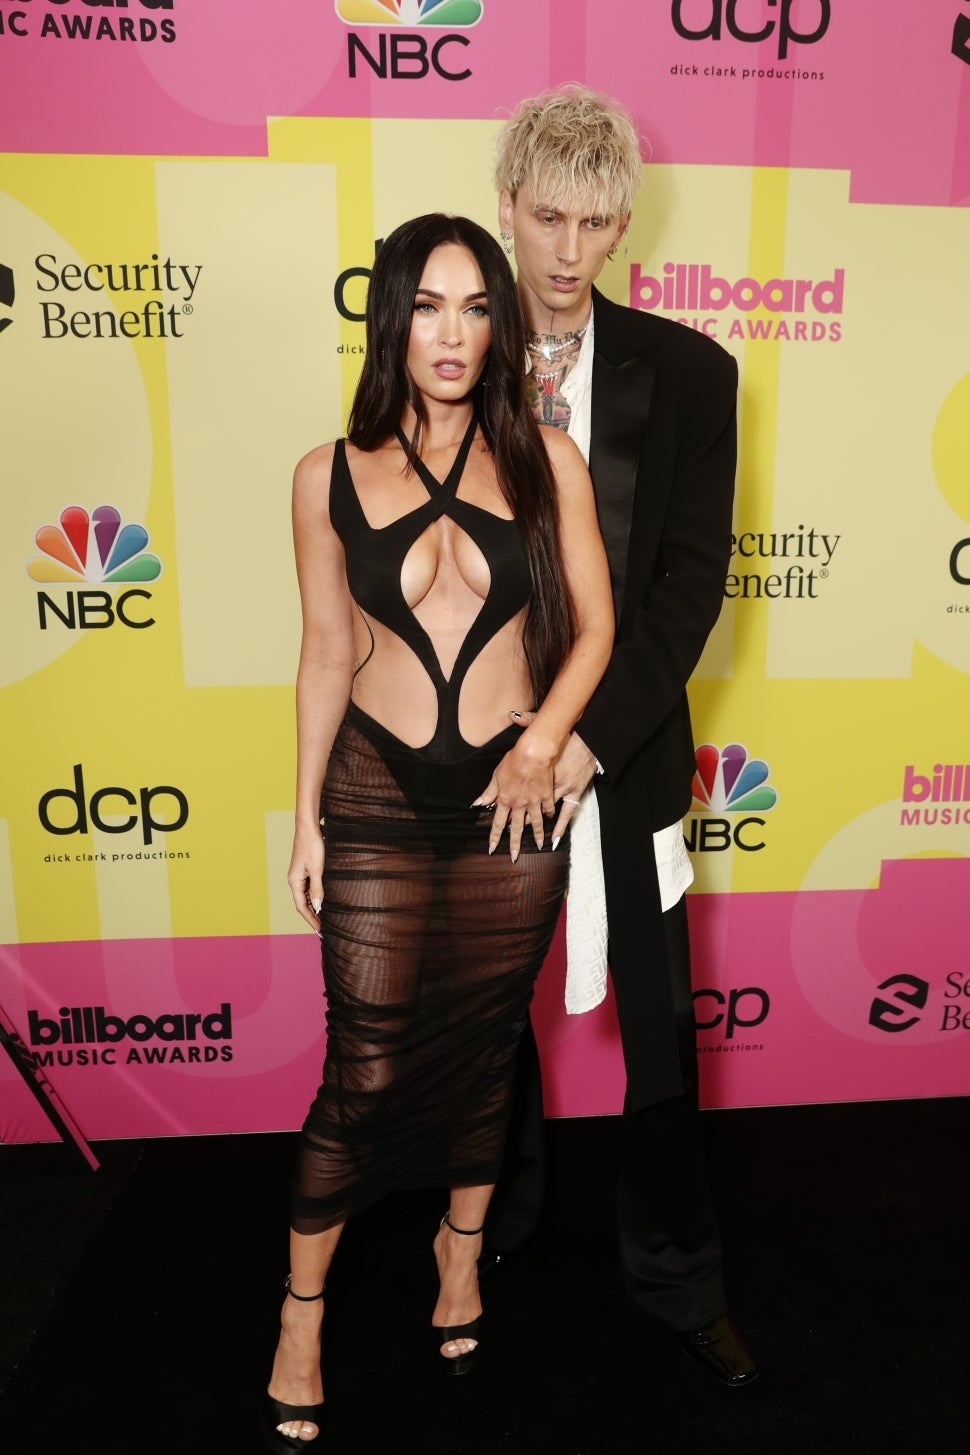 Billboard Music Awards 2021: Меган Фокс, Приянка Чопра, P!nk и другие на красной дорожке премии (ФОТО) - фото №1